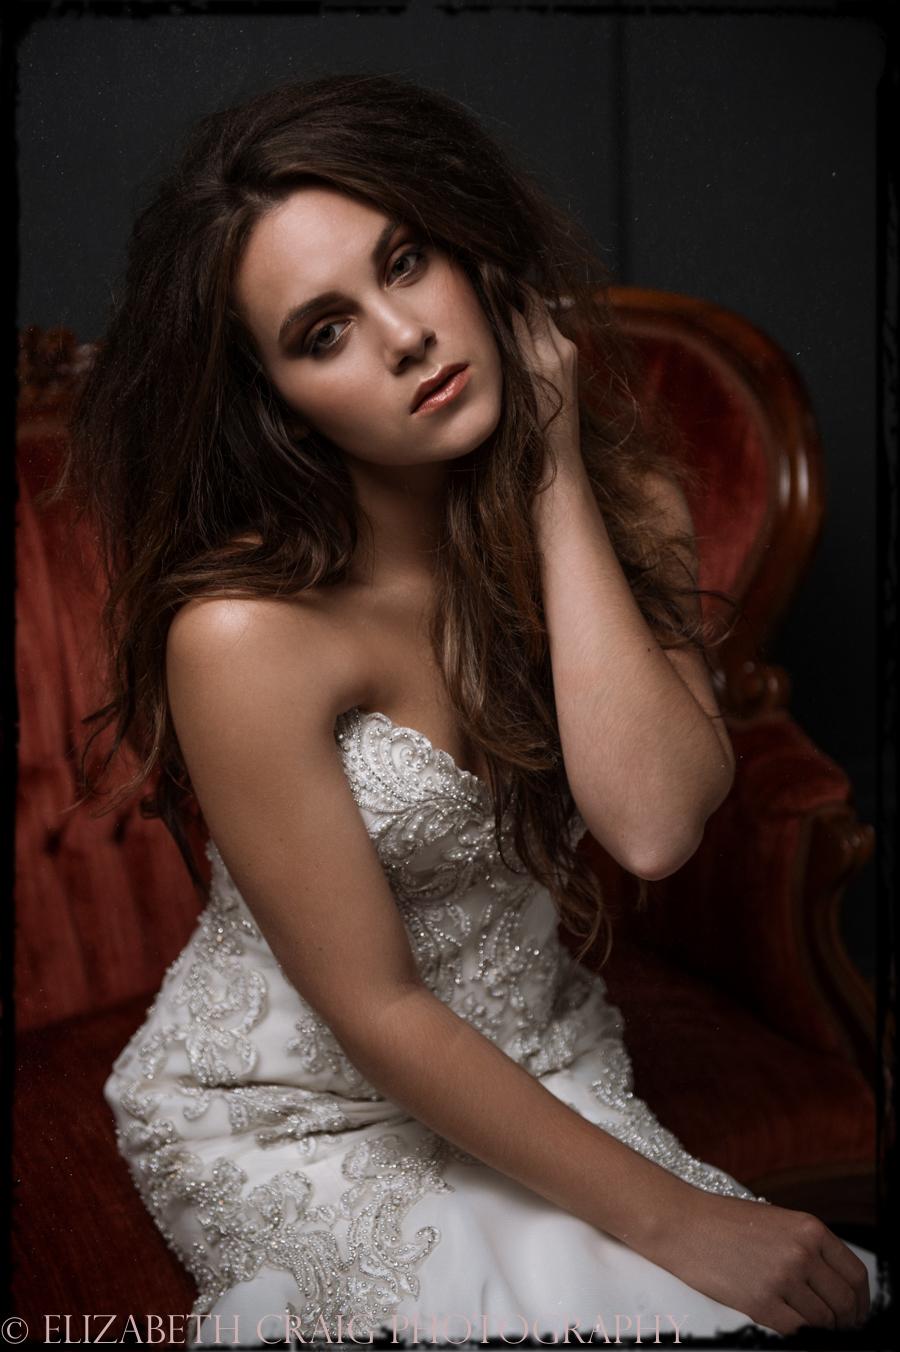 pittsburgh-boudoir-photographer-pittsburgh-wedding-photographer-elizabeth-craig-photography-005